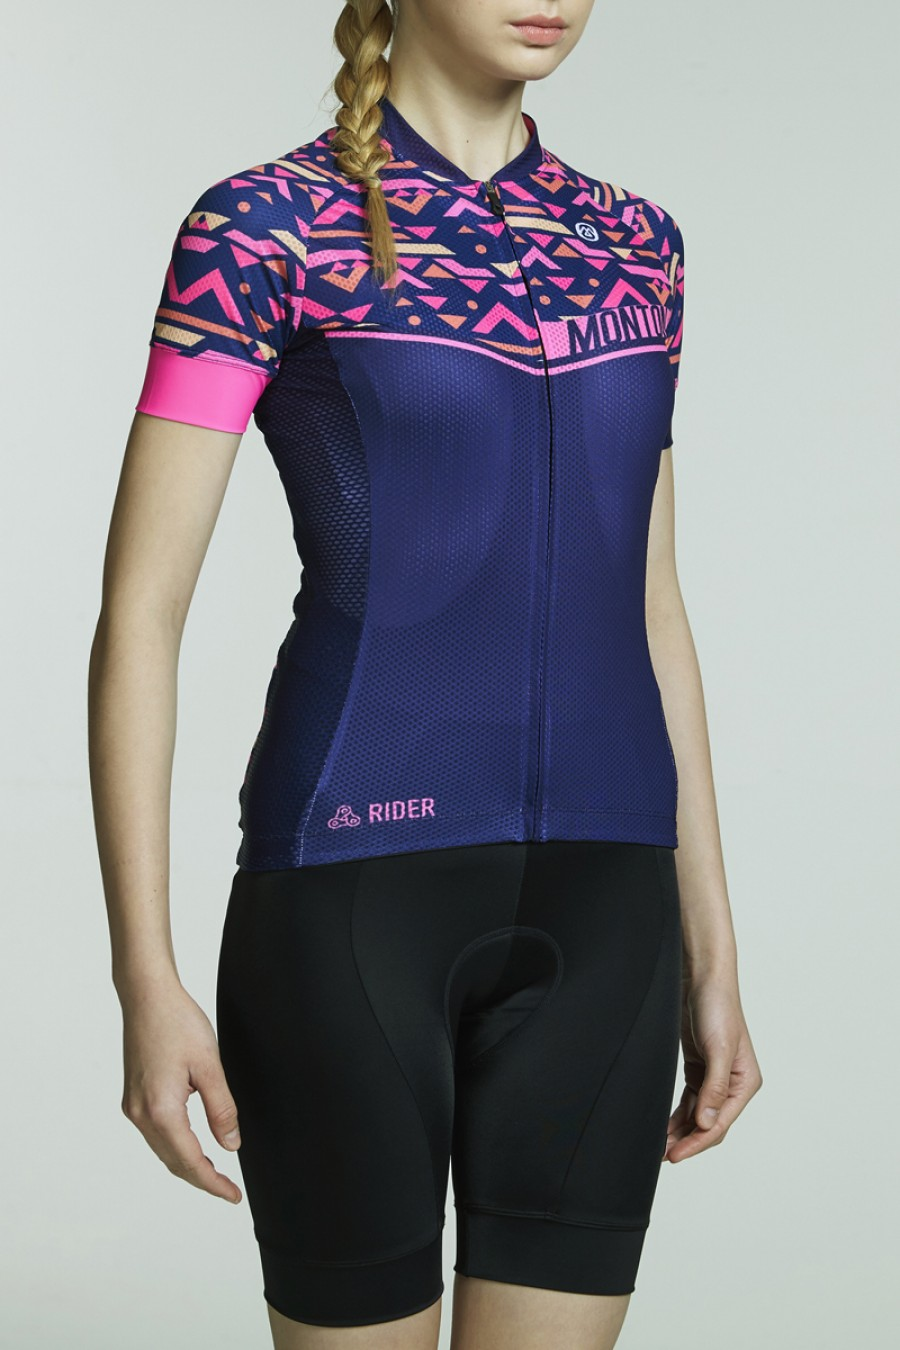 2017 unique cycling jersey women